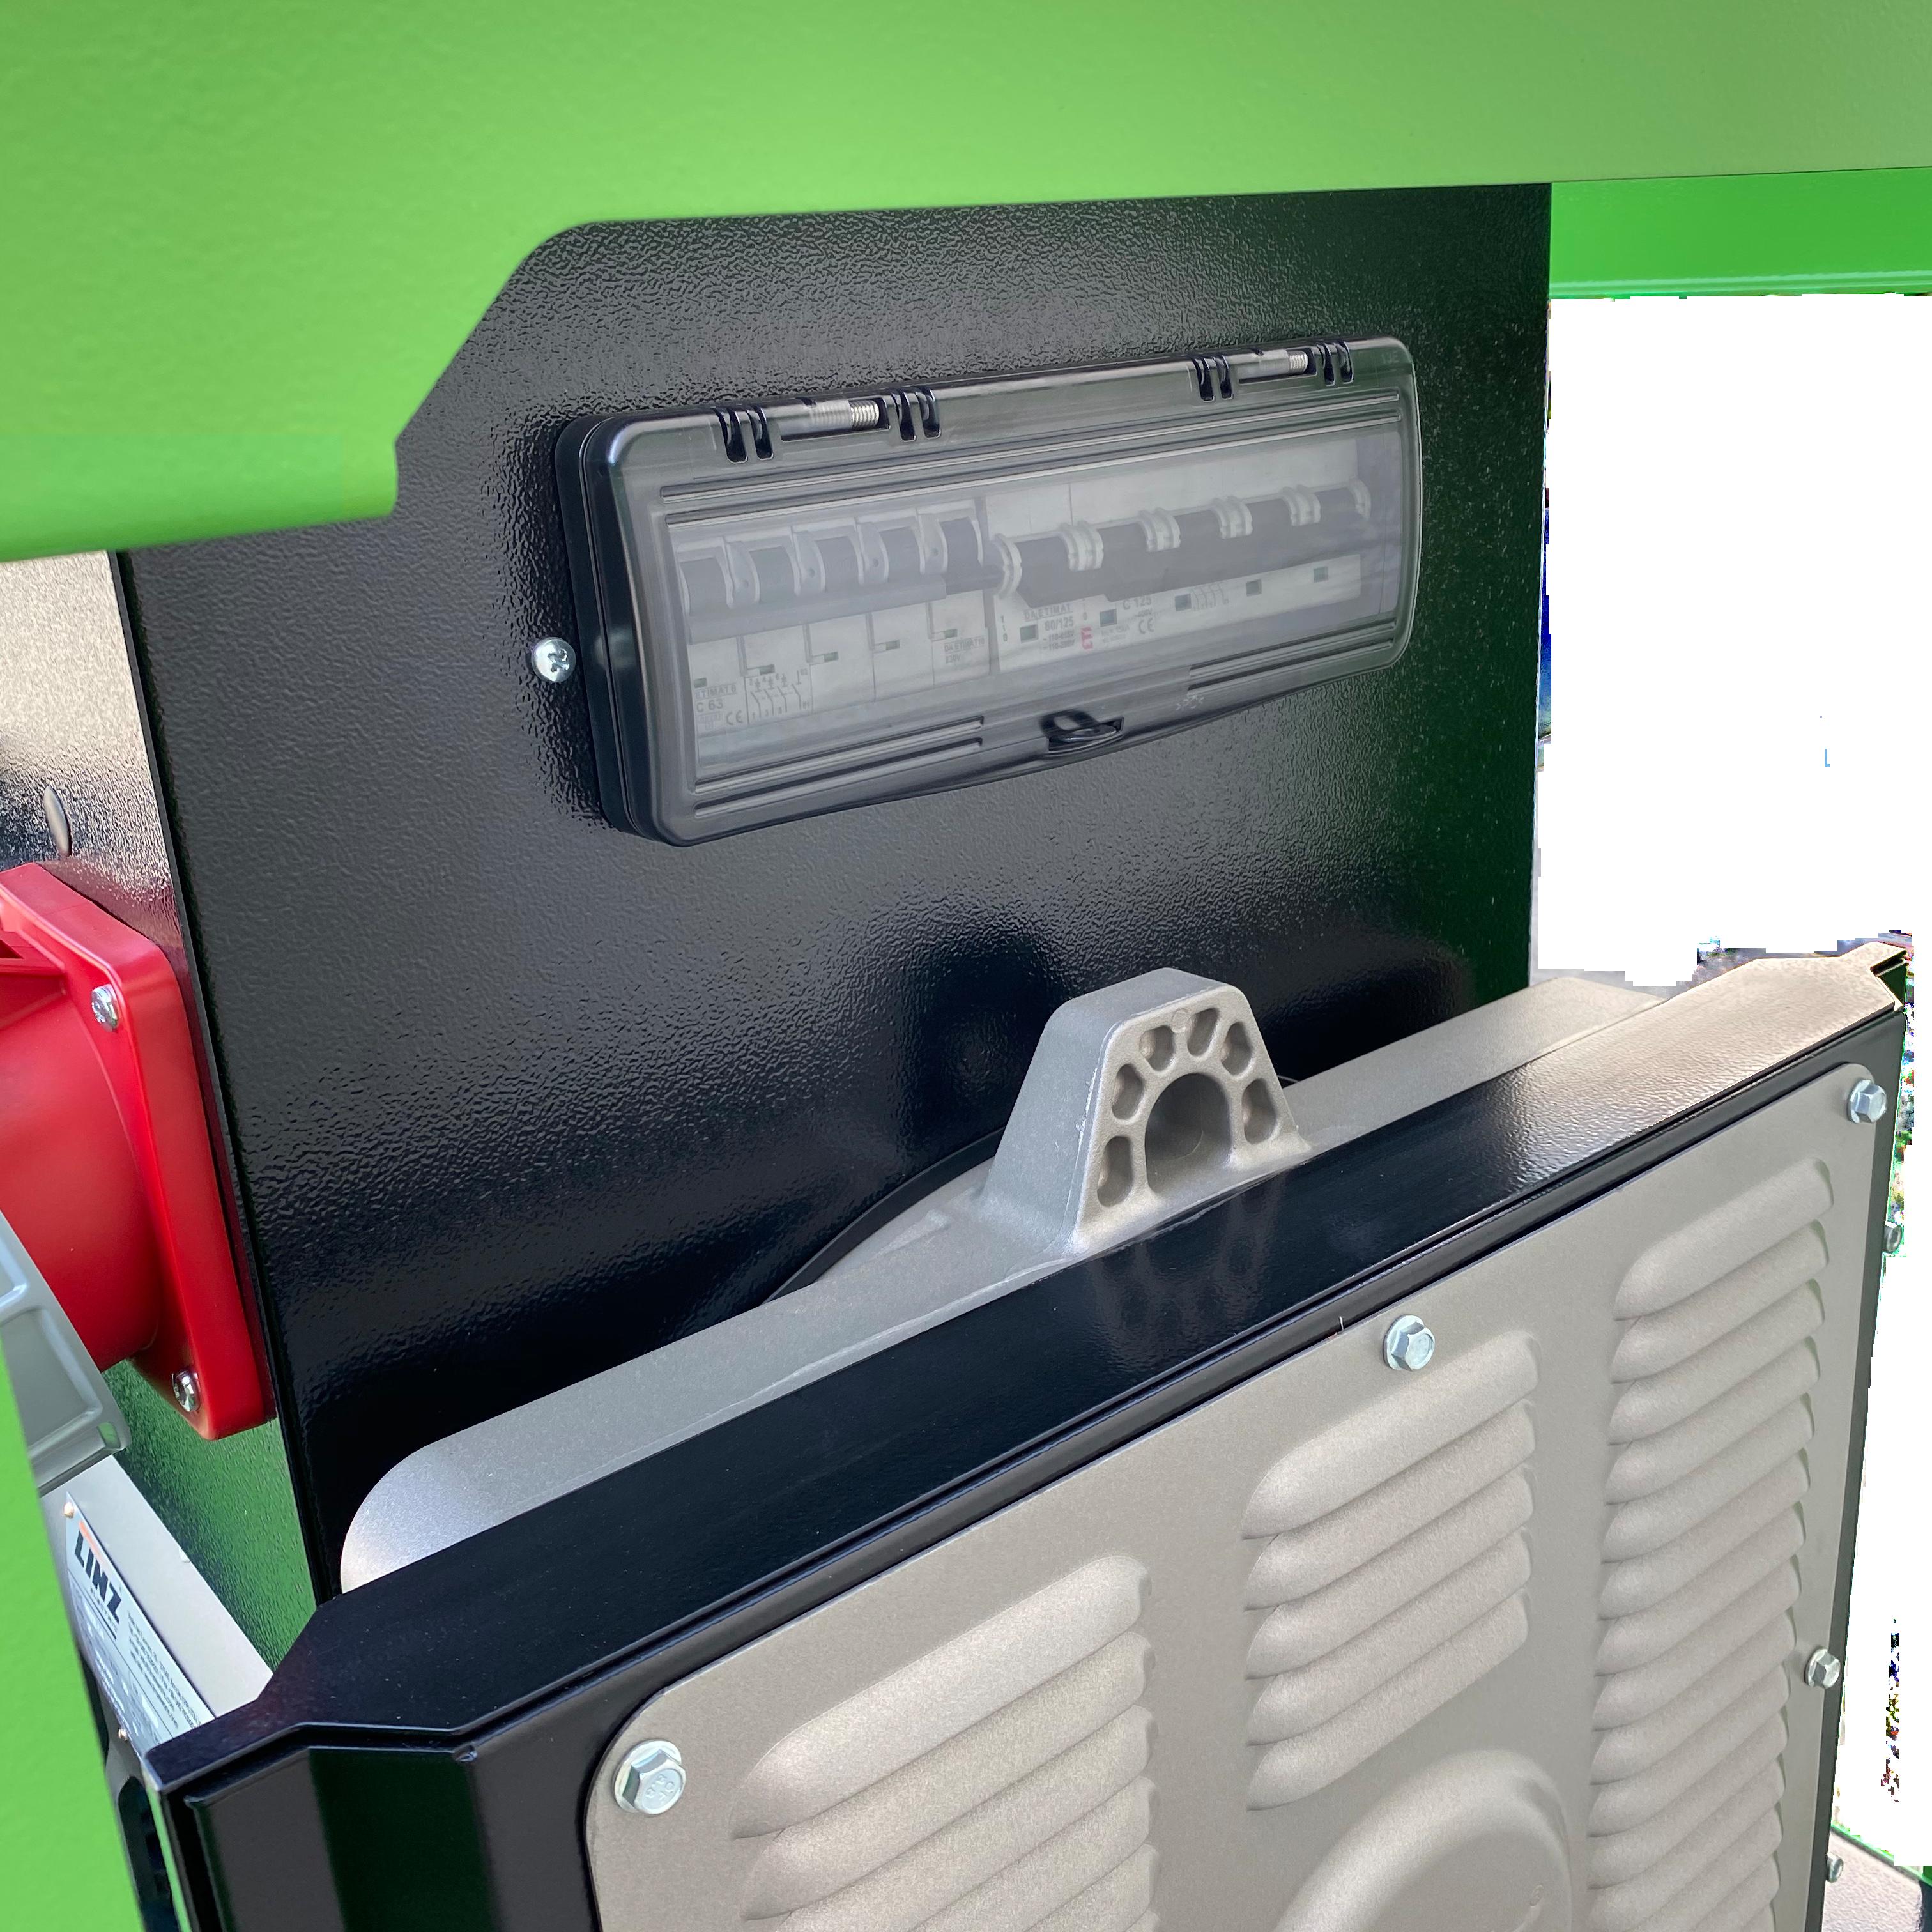 ENERGY Zapfwellengenerator 27,5 kVA ADEY-25TCS-AVR-IP-ISO mit AVR & IP44 Haus & Feldbetrieb